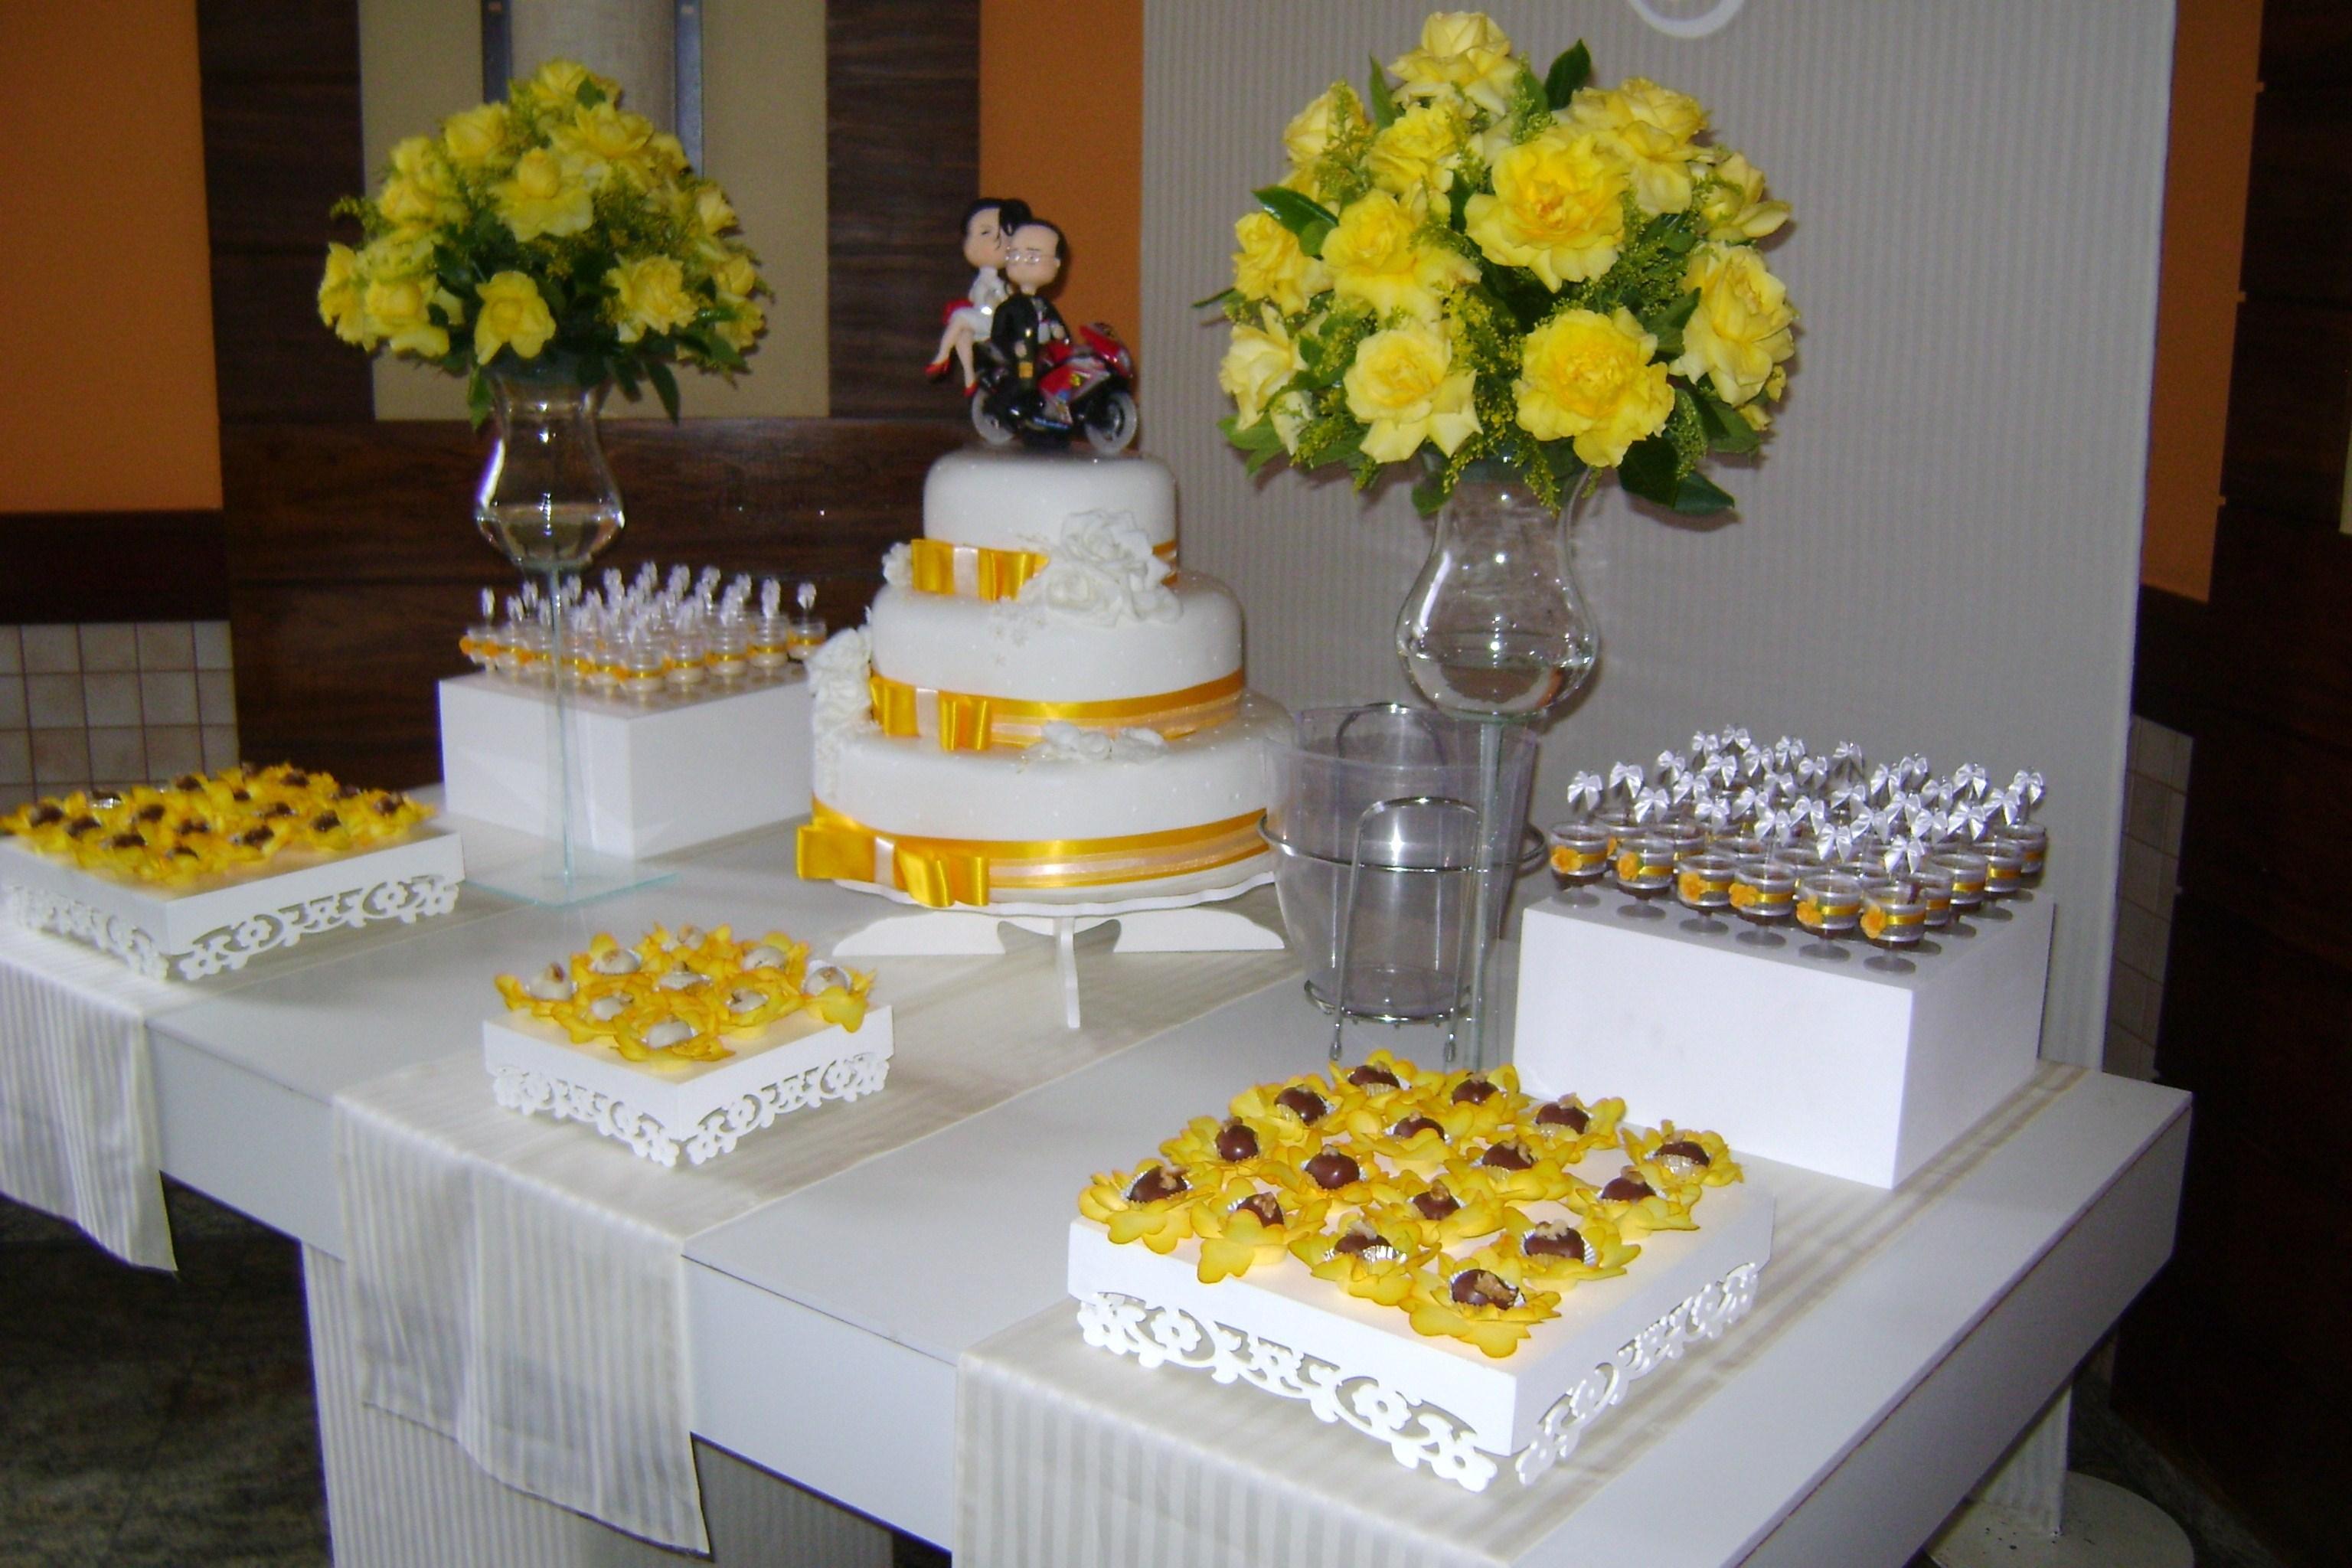 Decora??o de Casamento Clean Loc Cakes e festas Elo7